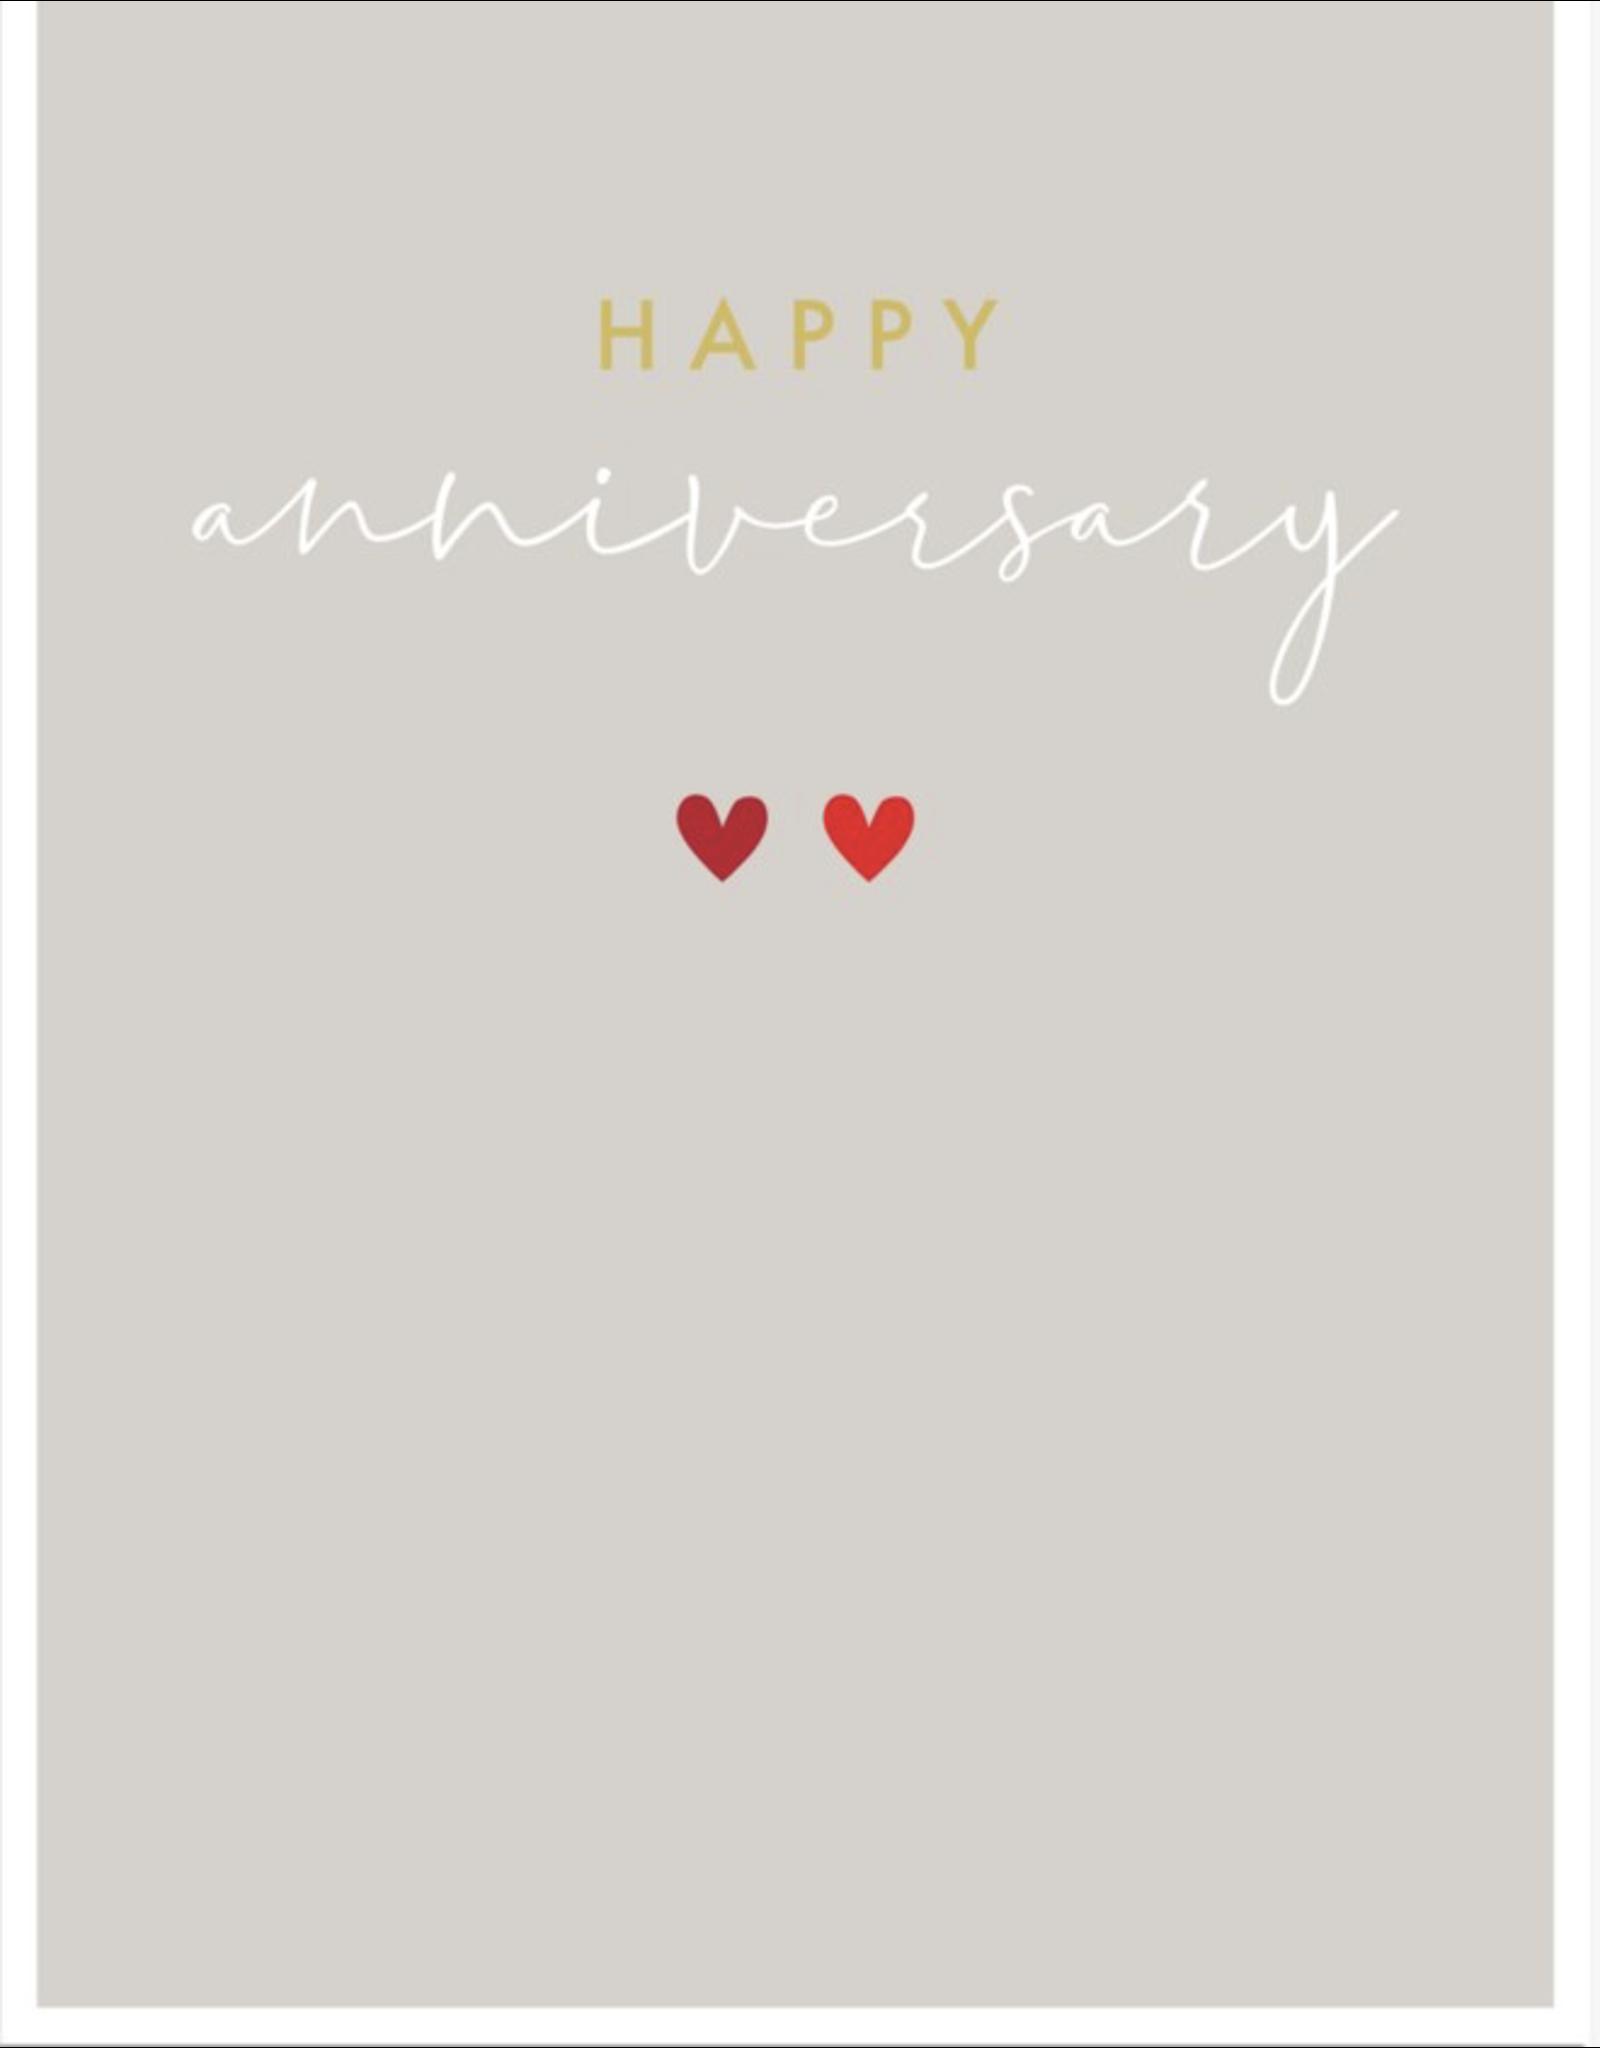 Anniversary - 2 Hearts